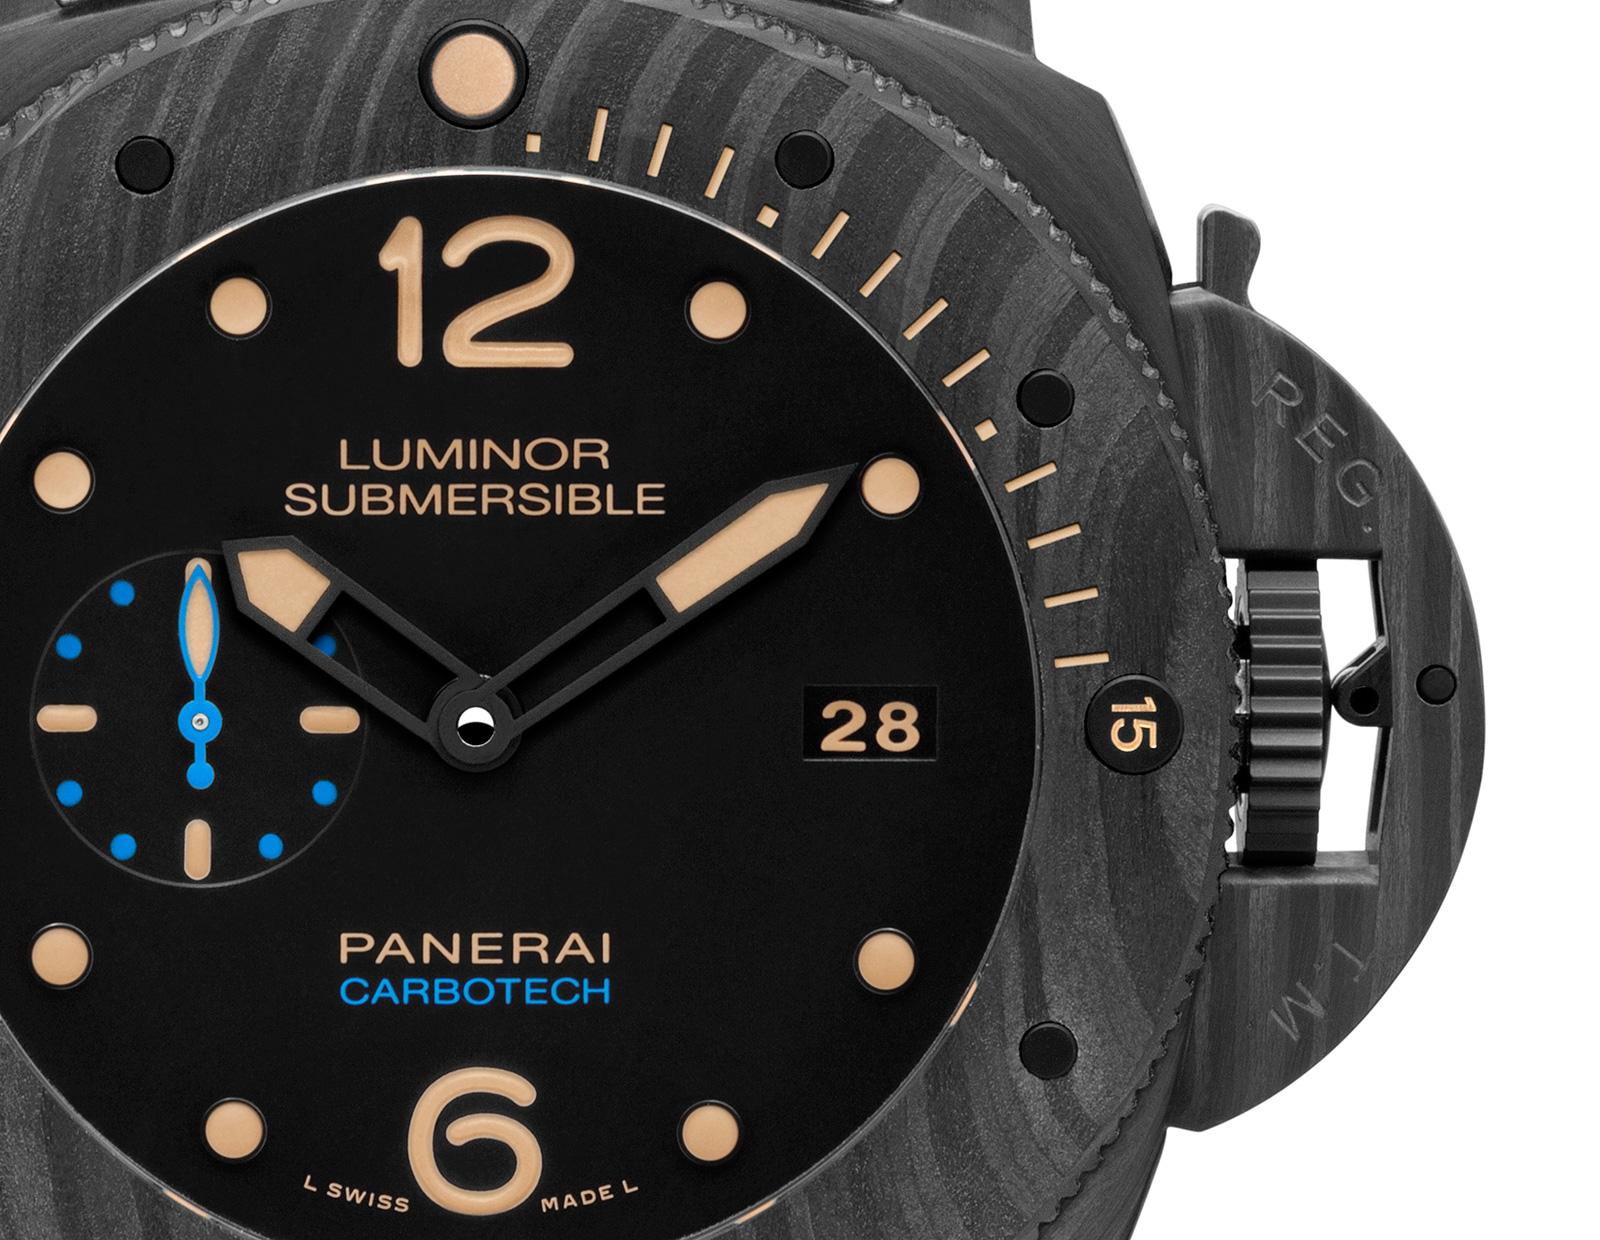 Panerai-Luminor-Submersible-1950-Carbotech-7